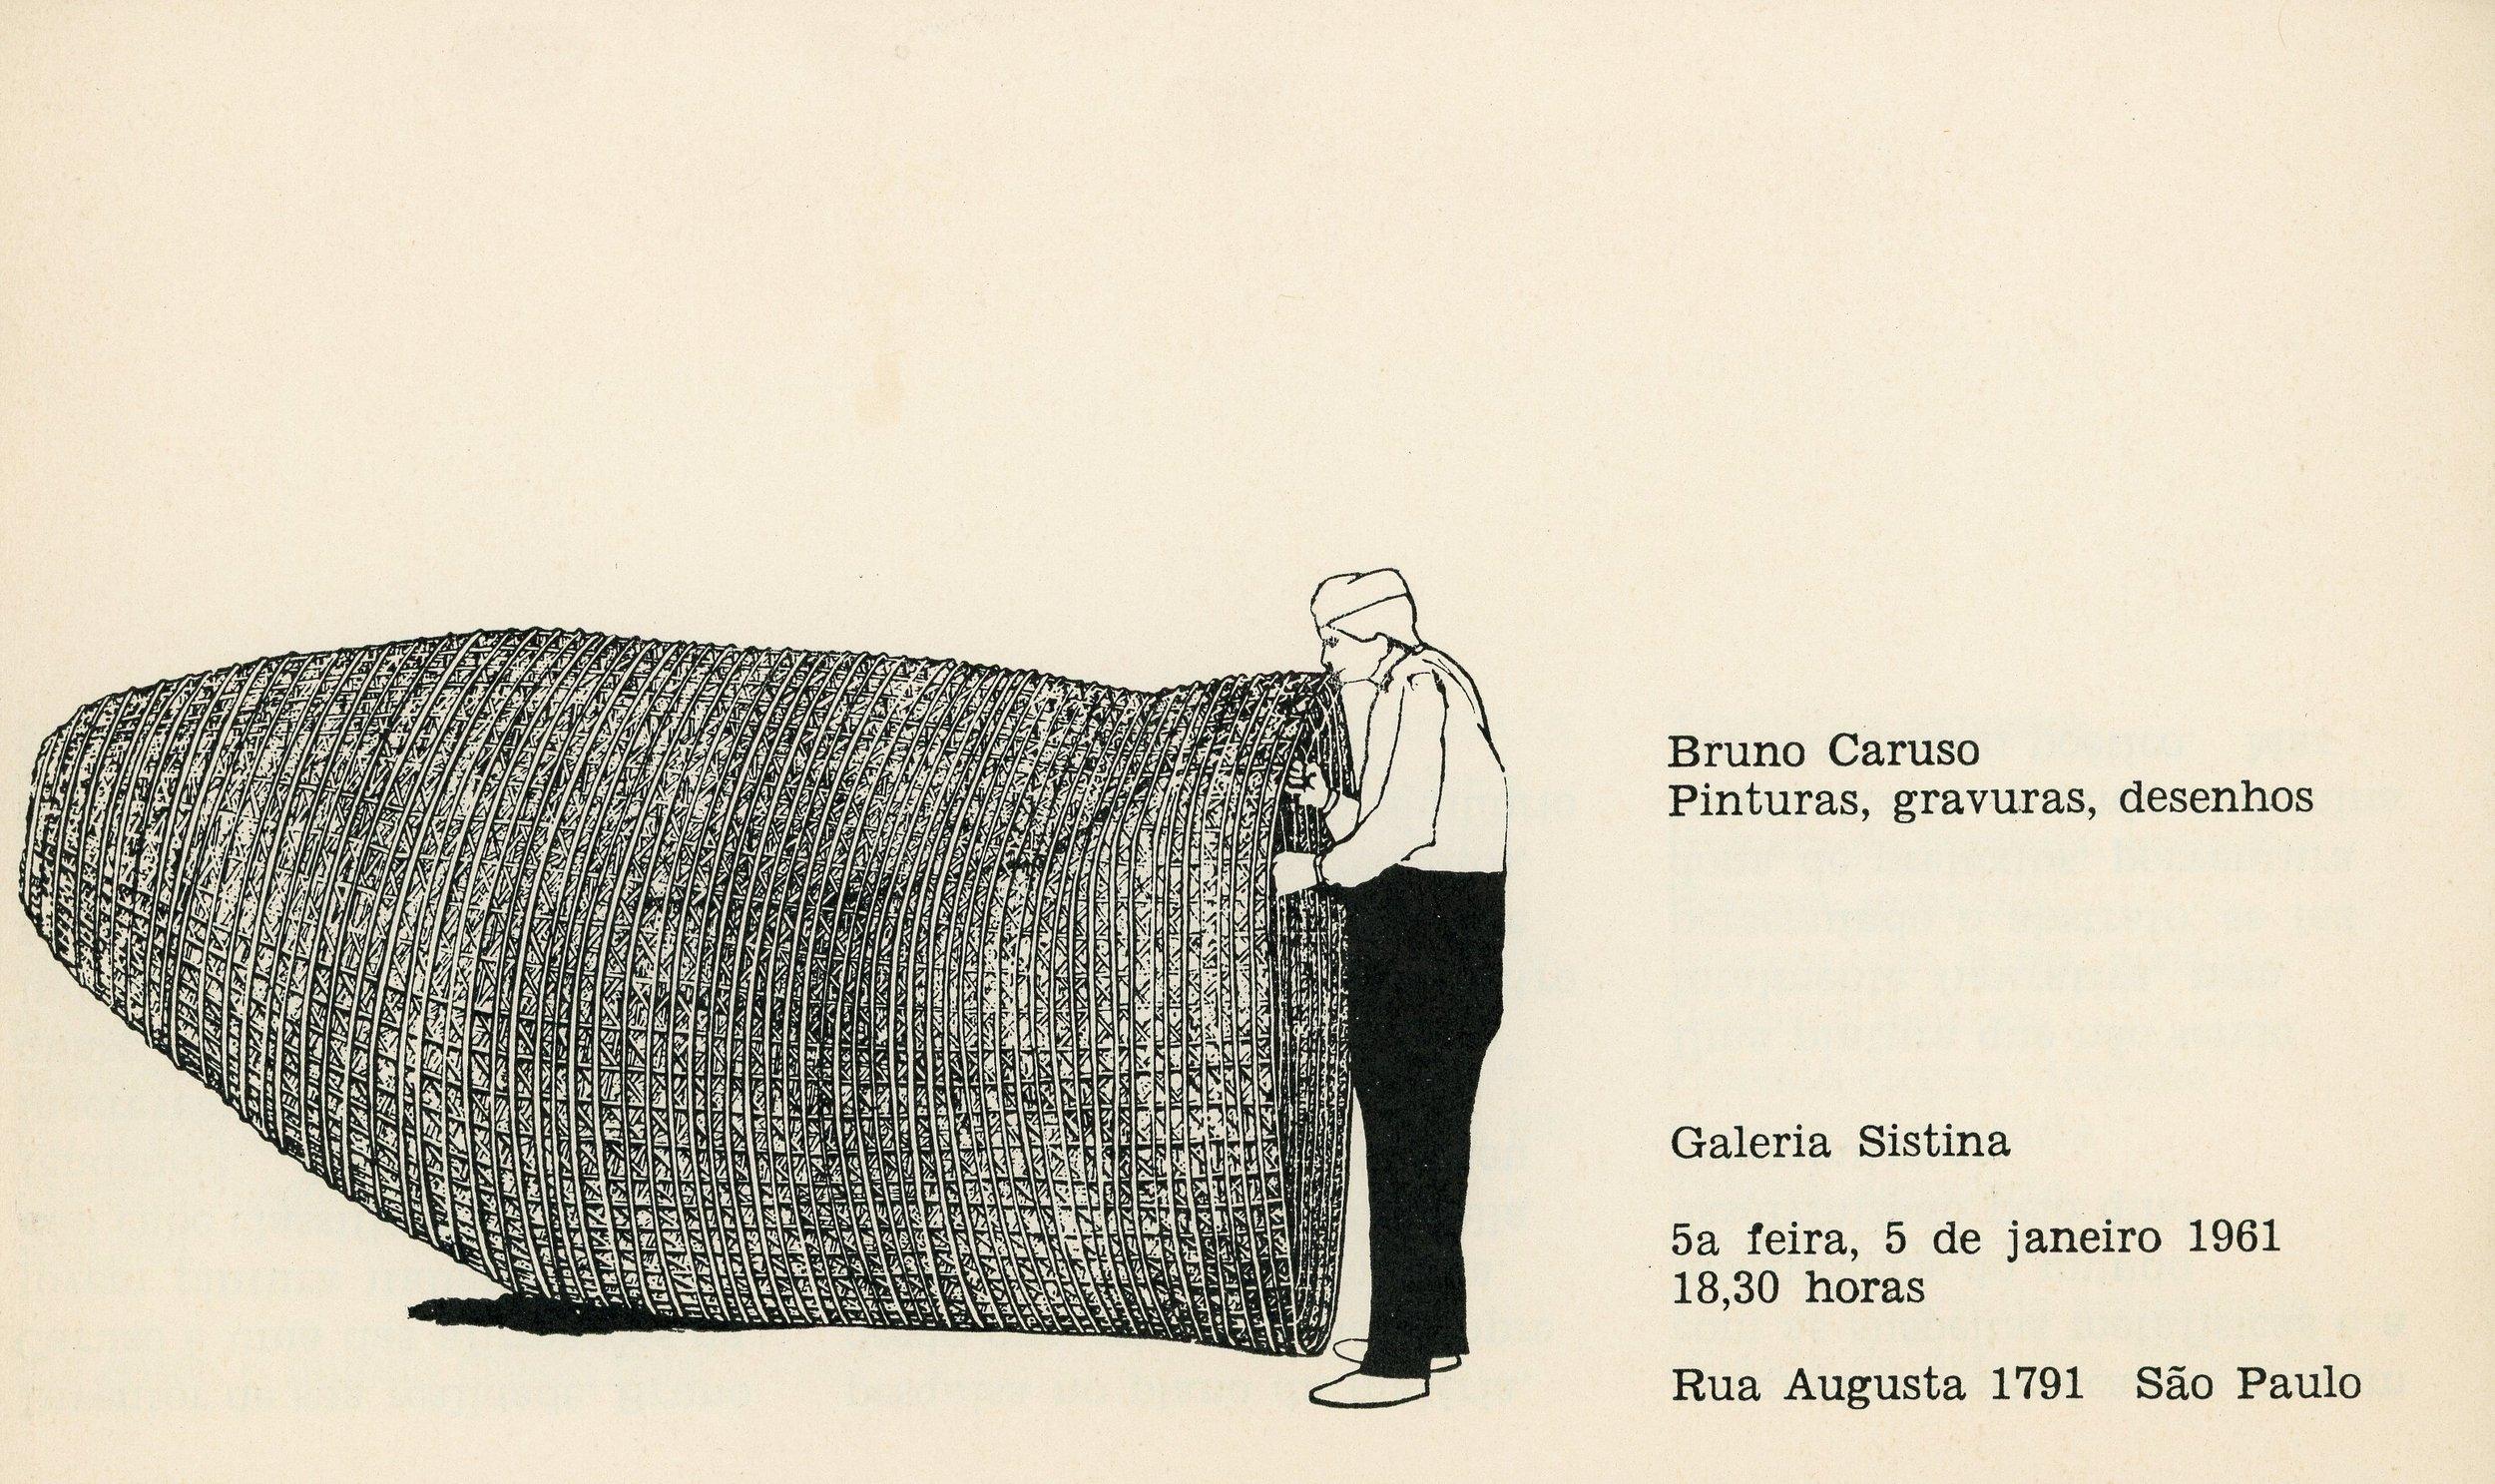 1961-01 Galeria Sistina - Bruno Caruso_02.jpg